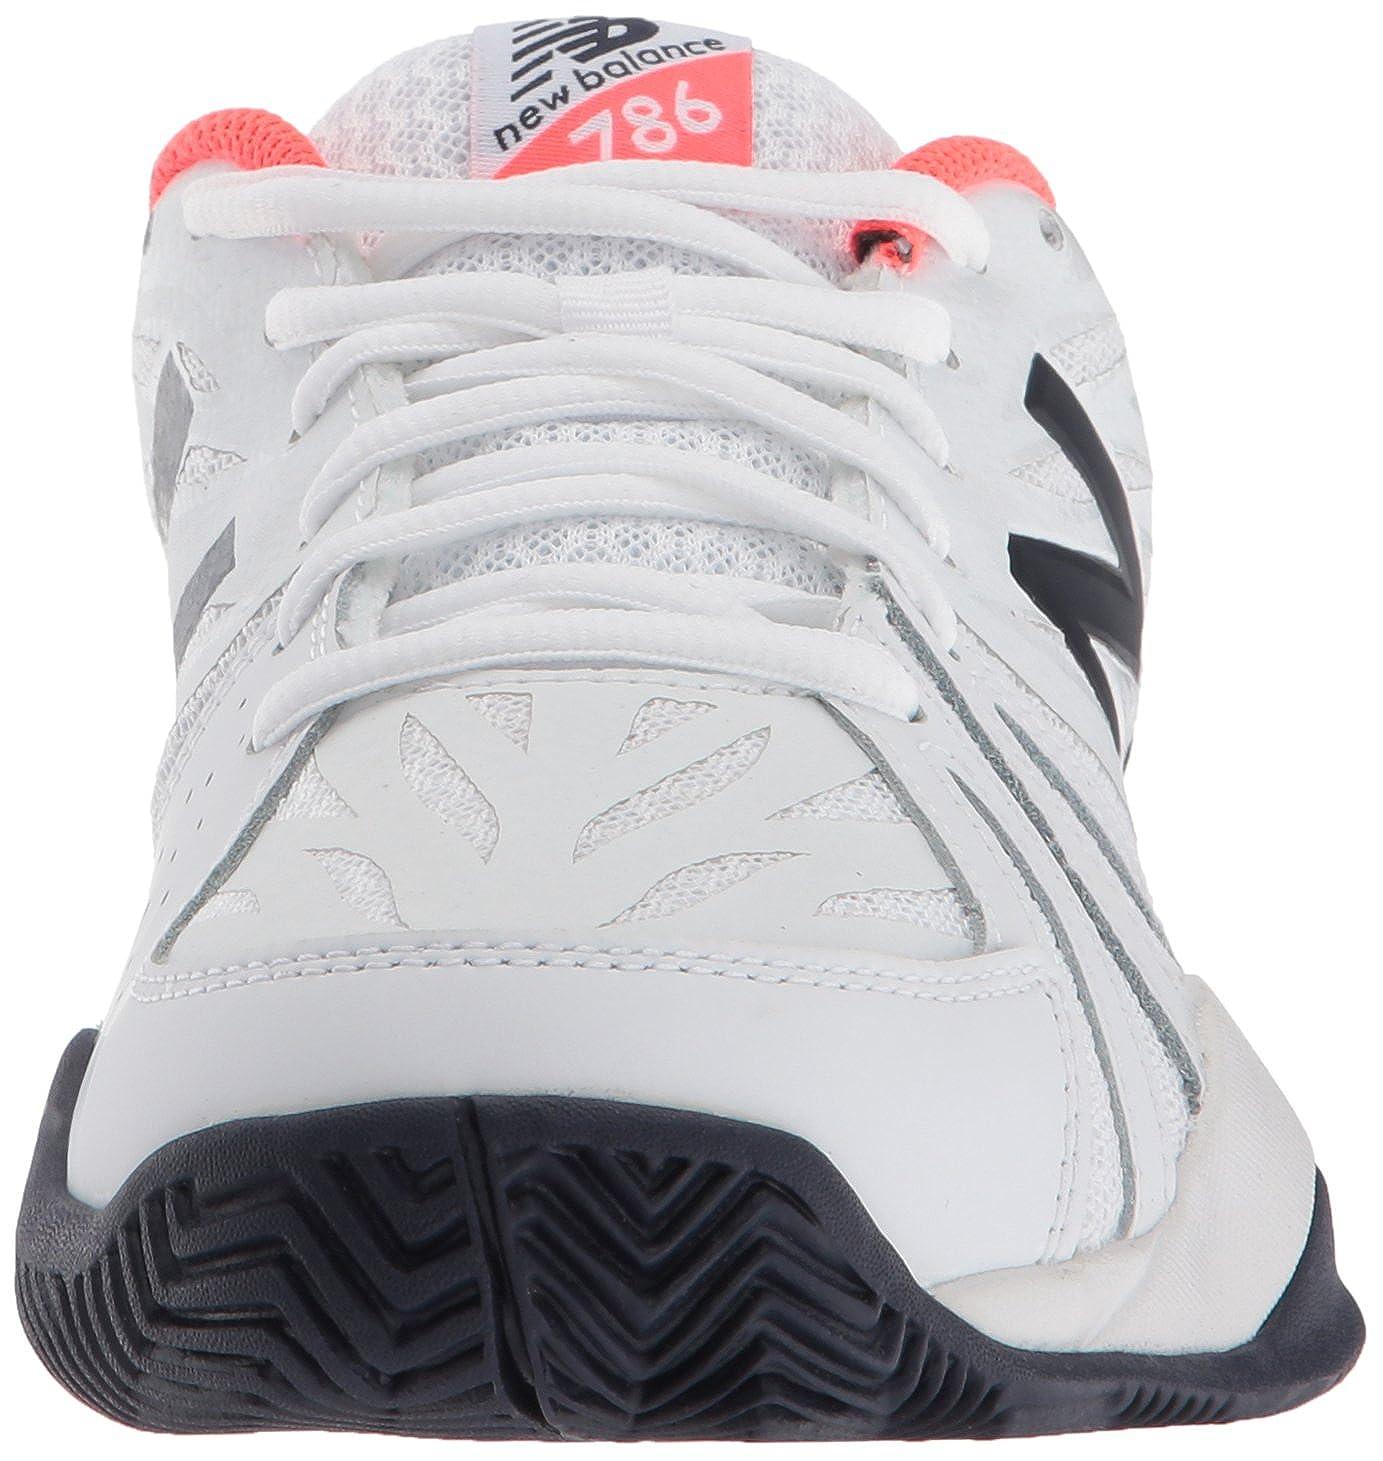 New Balance Wch786v2, Zapatillas de Tenis para Mujer: New Balance ...